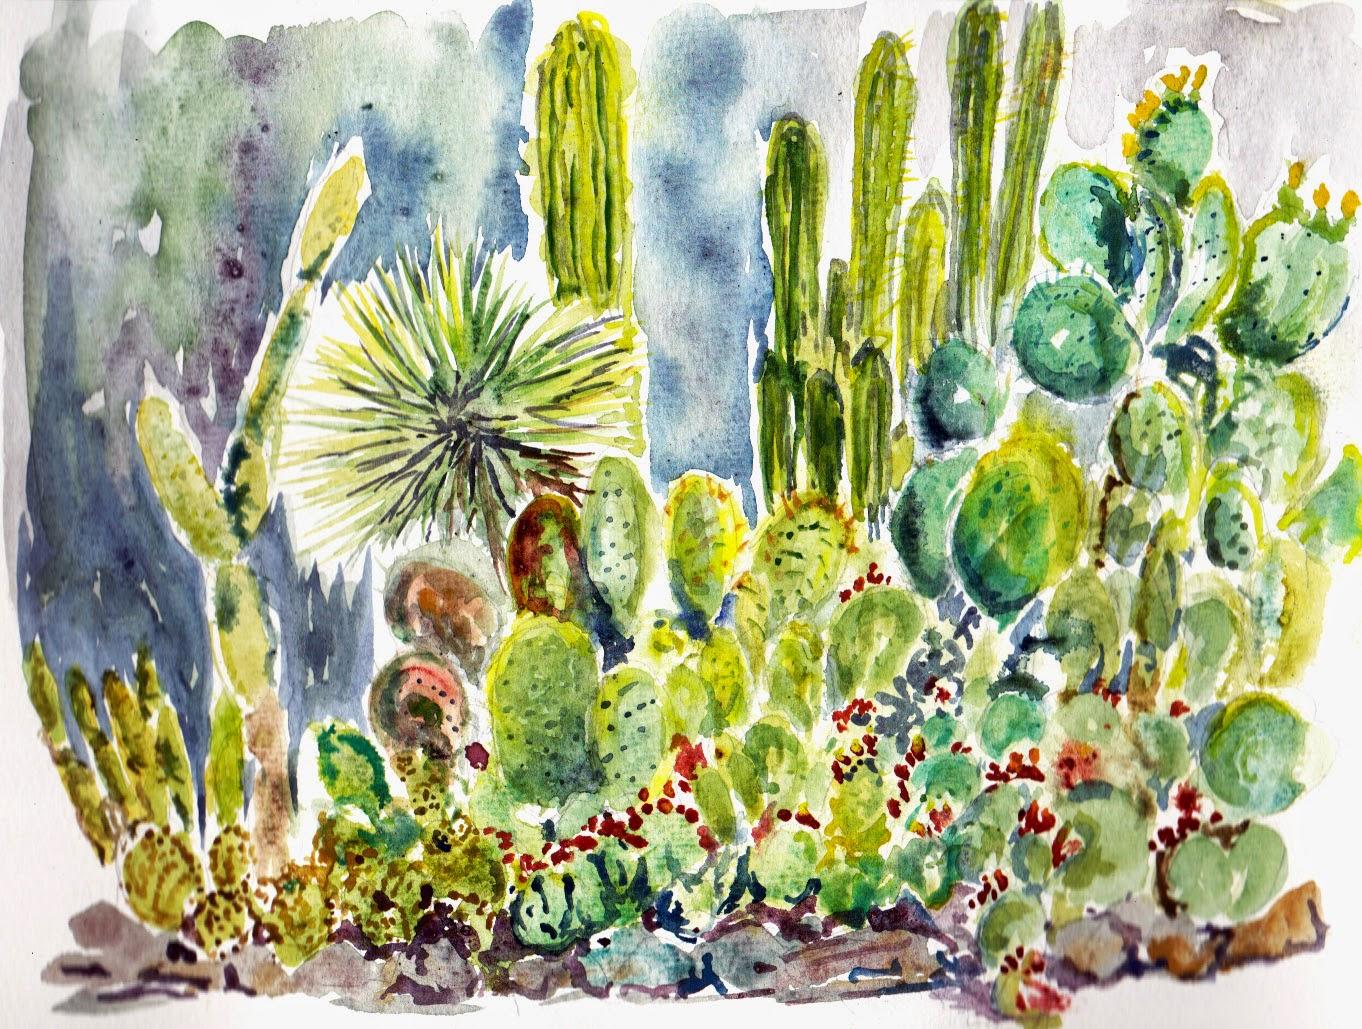 Bradu0027s Painting Of More Rioting Cacti